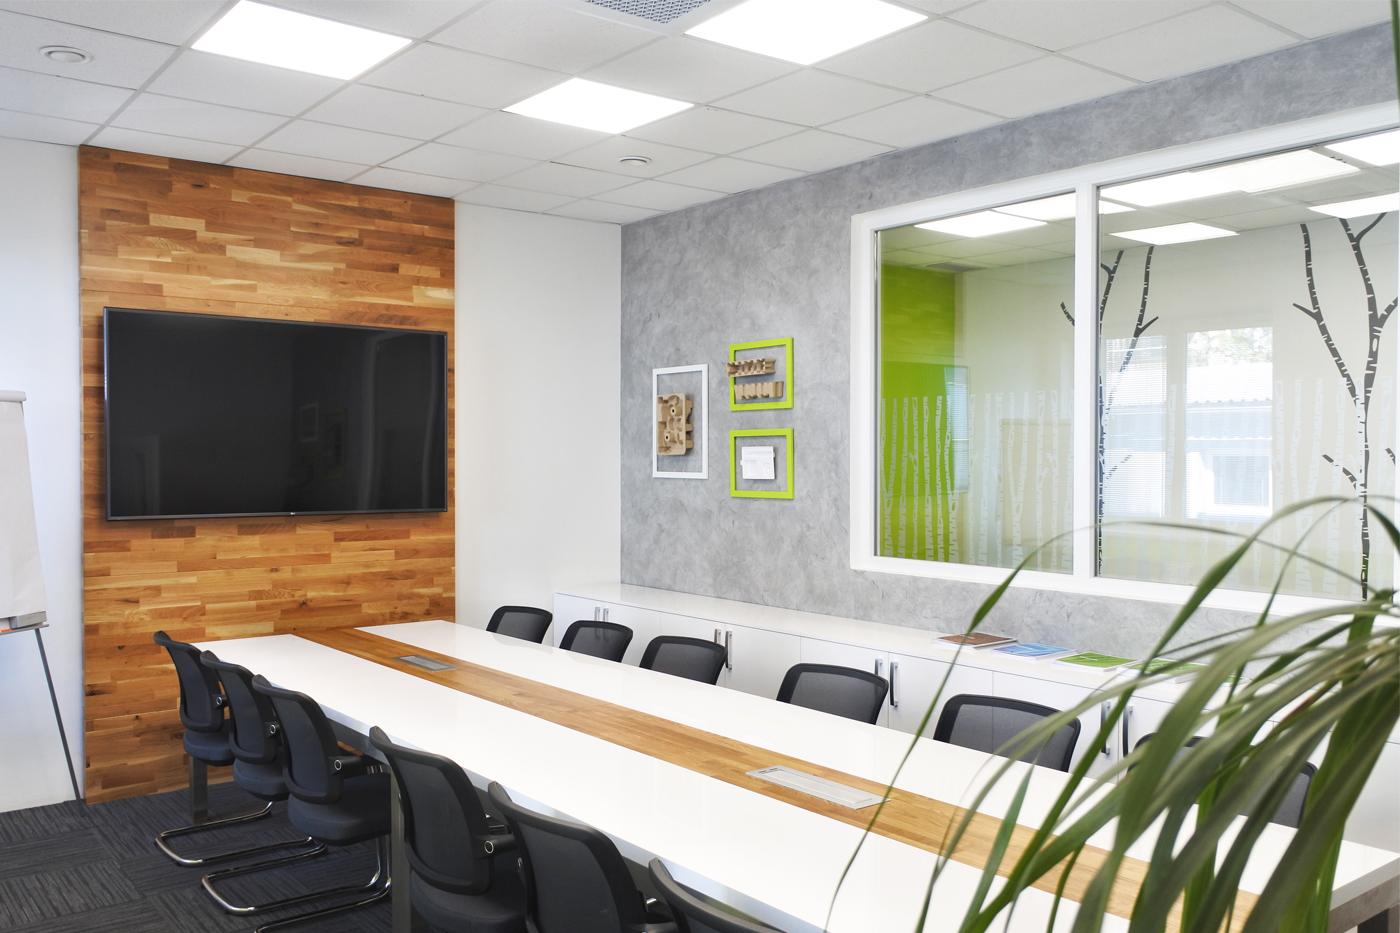 Design interiérů firmy Tridas, která se zabývá výrobou nasávané kartonáže.